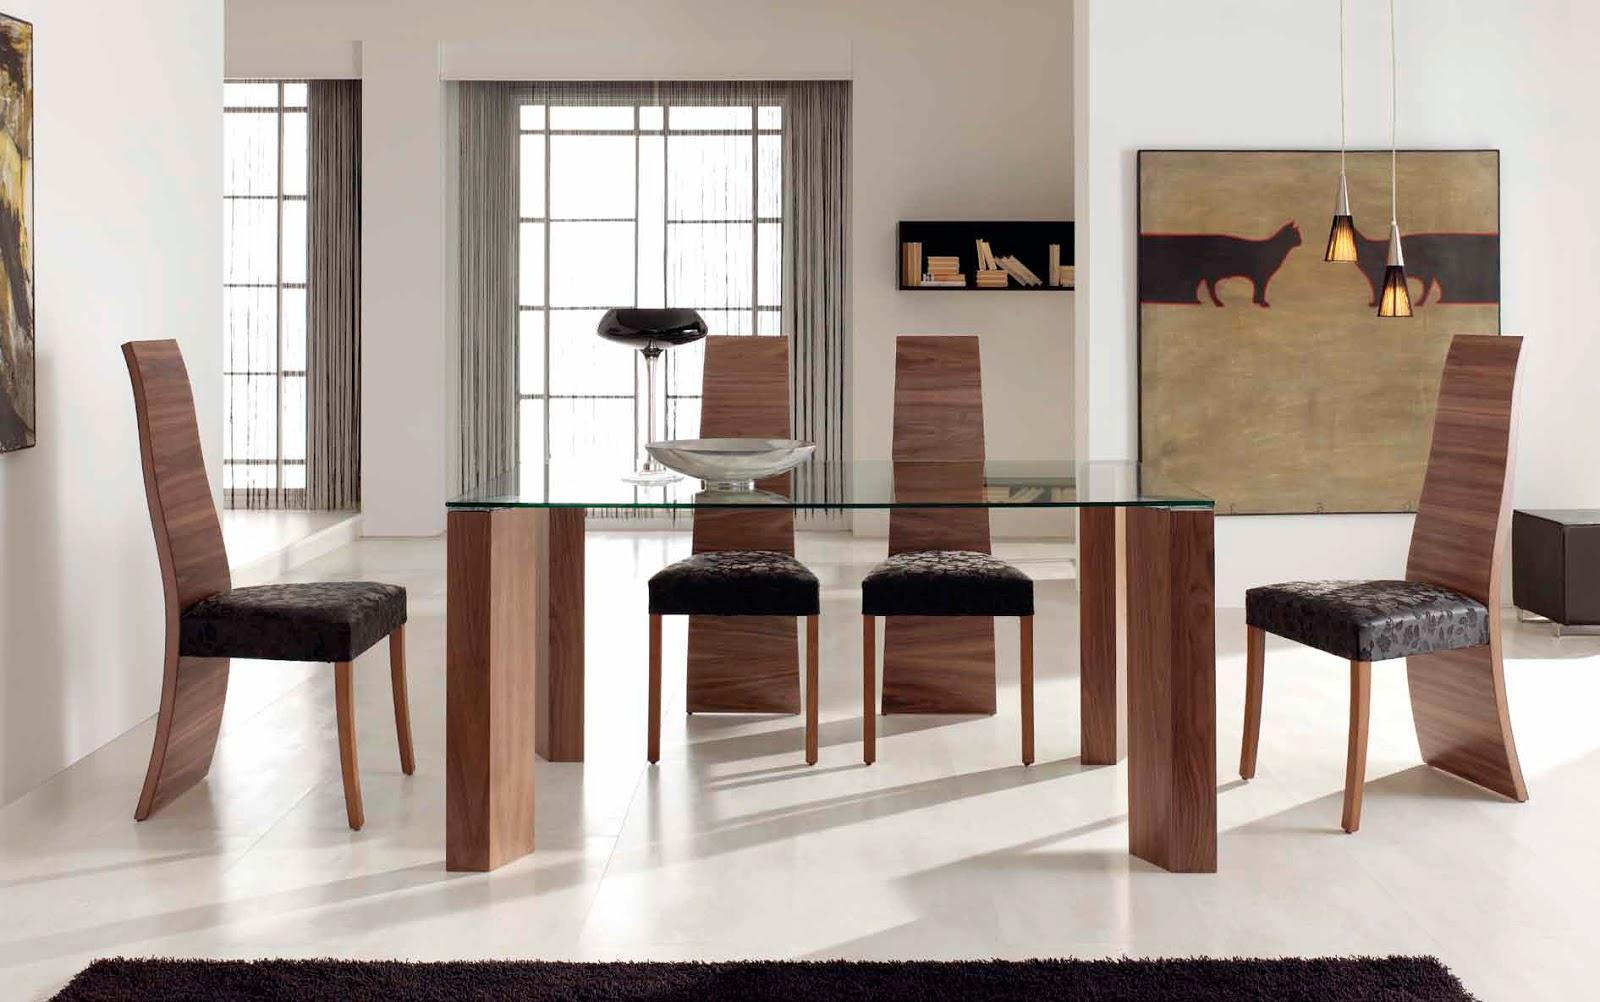 Mesas de comedor como decorar una mesa de comedor de cristal for Mesas ovaladas de cristal